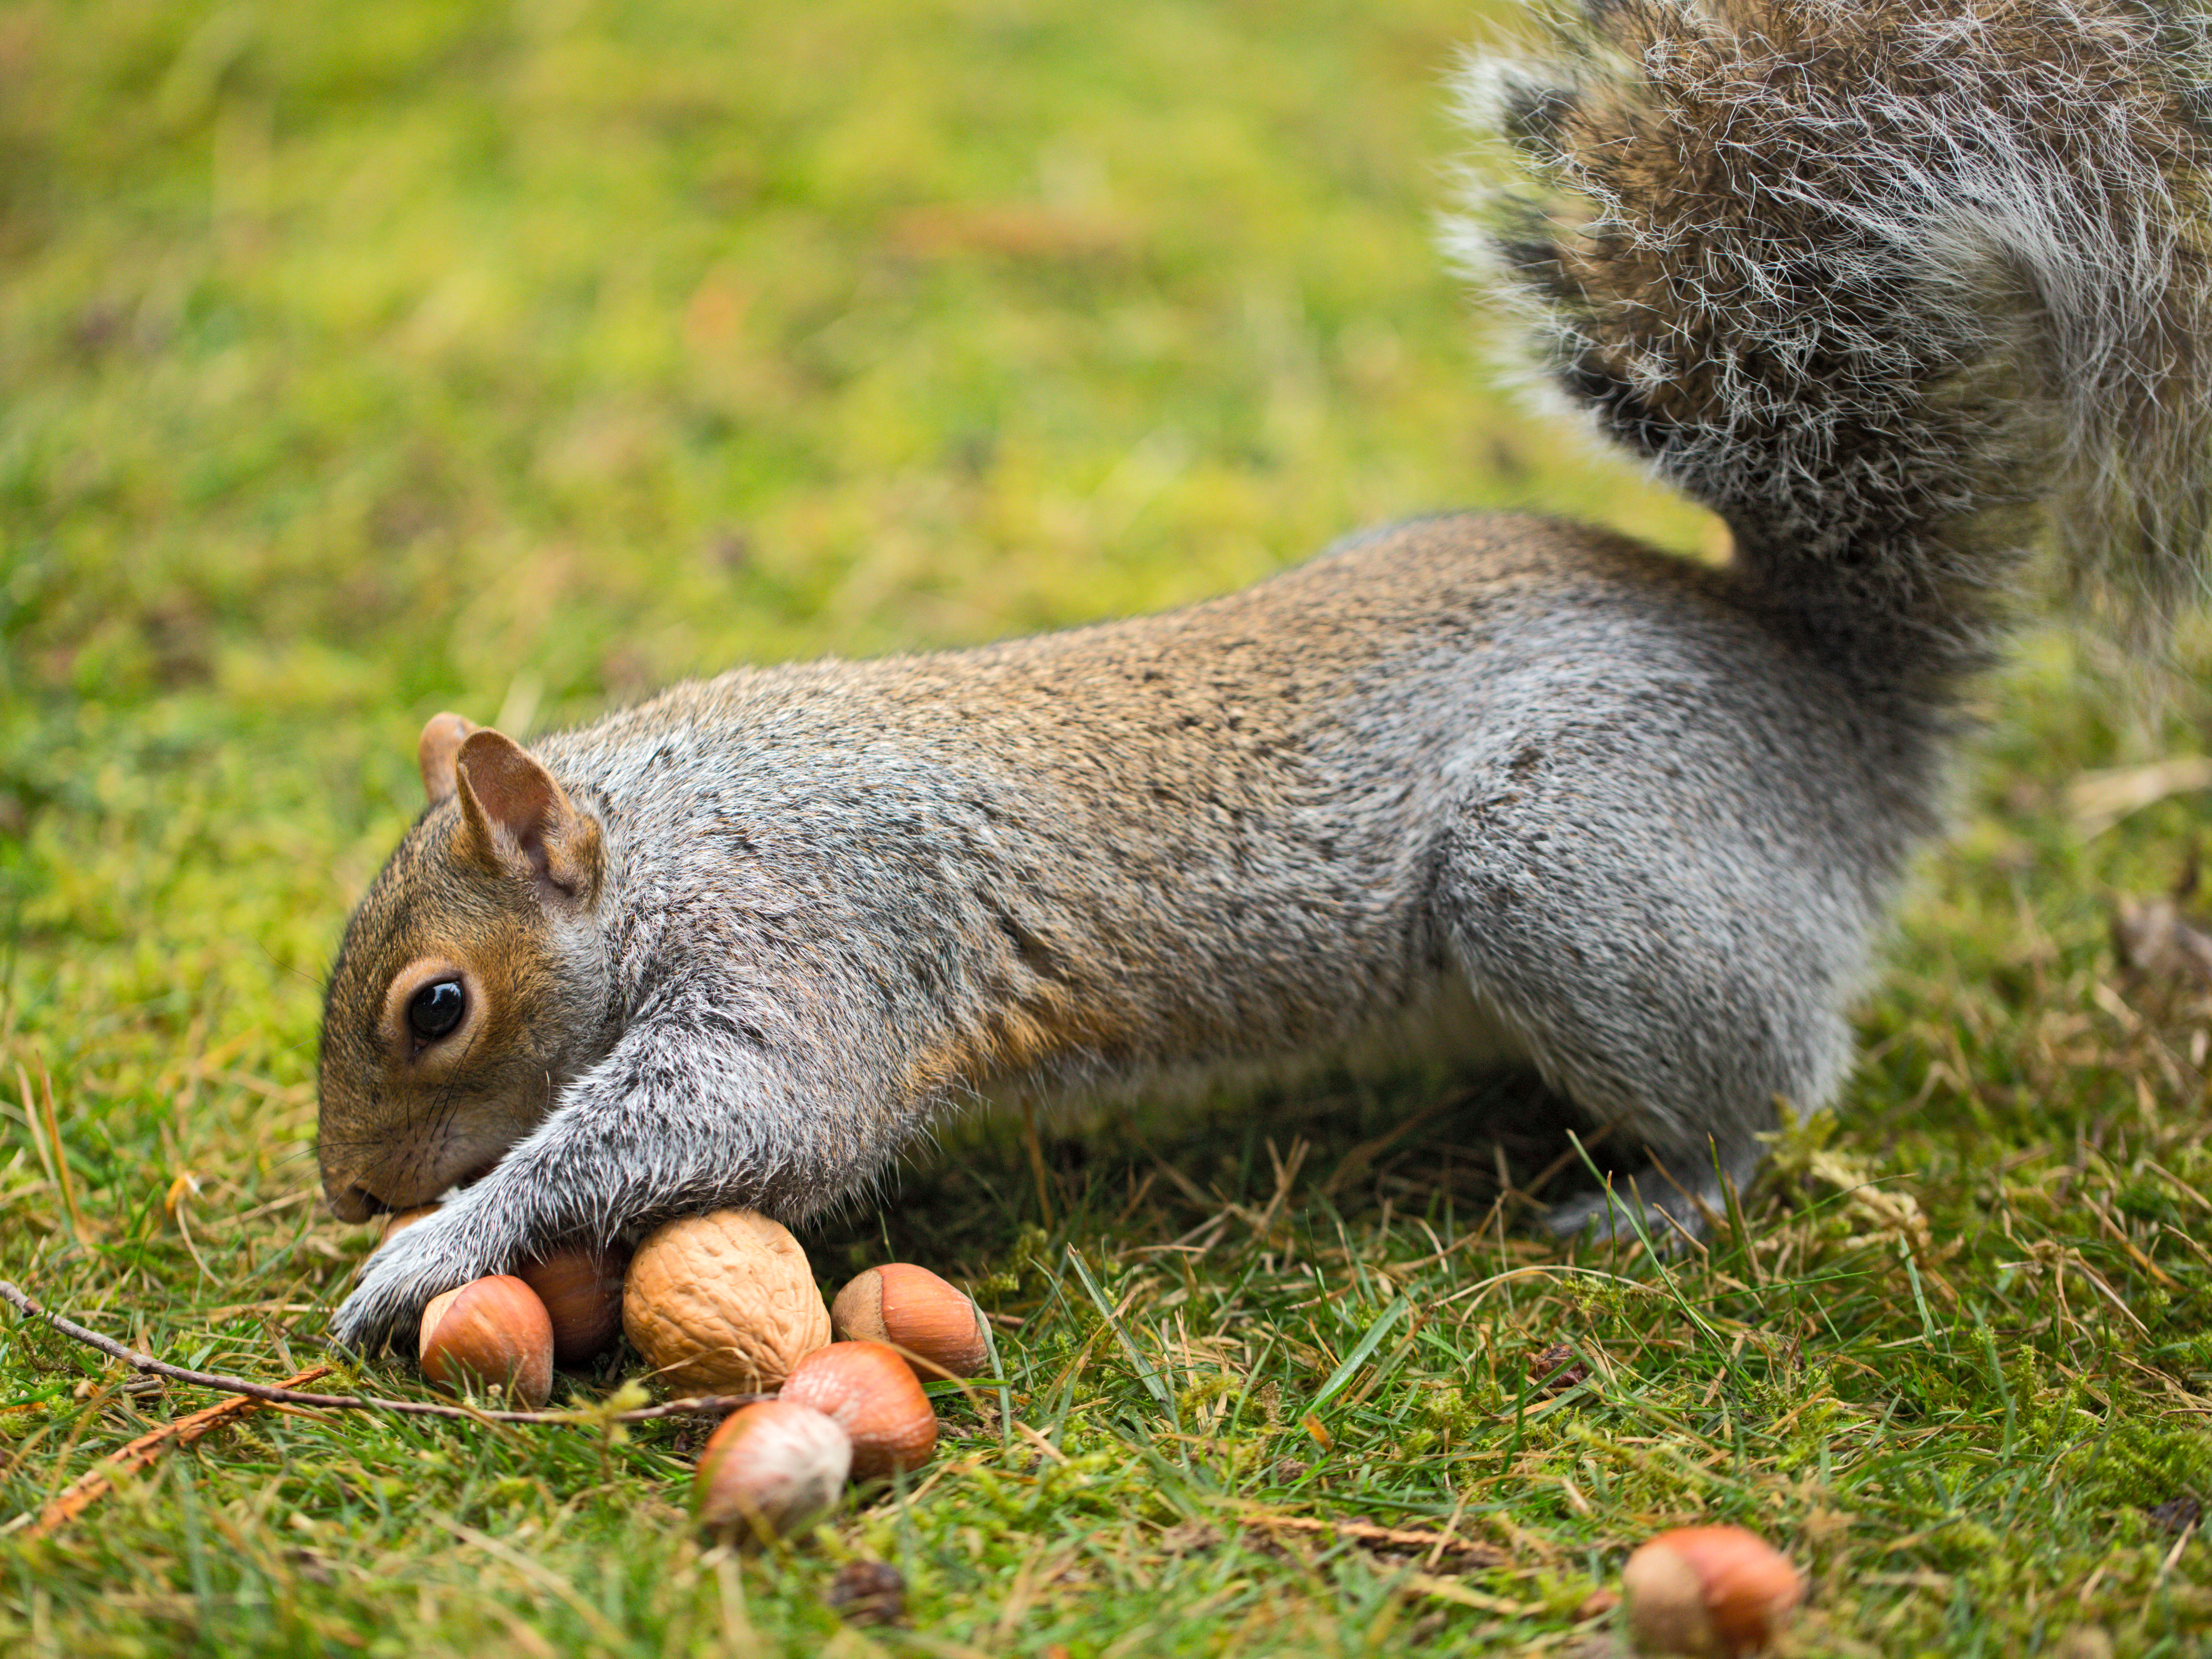 squirrel hides nut in fur of bernese mountain dog